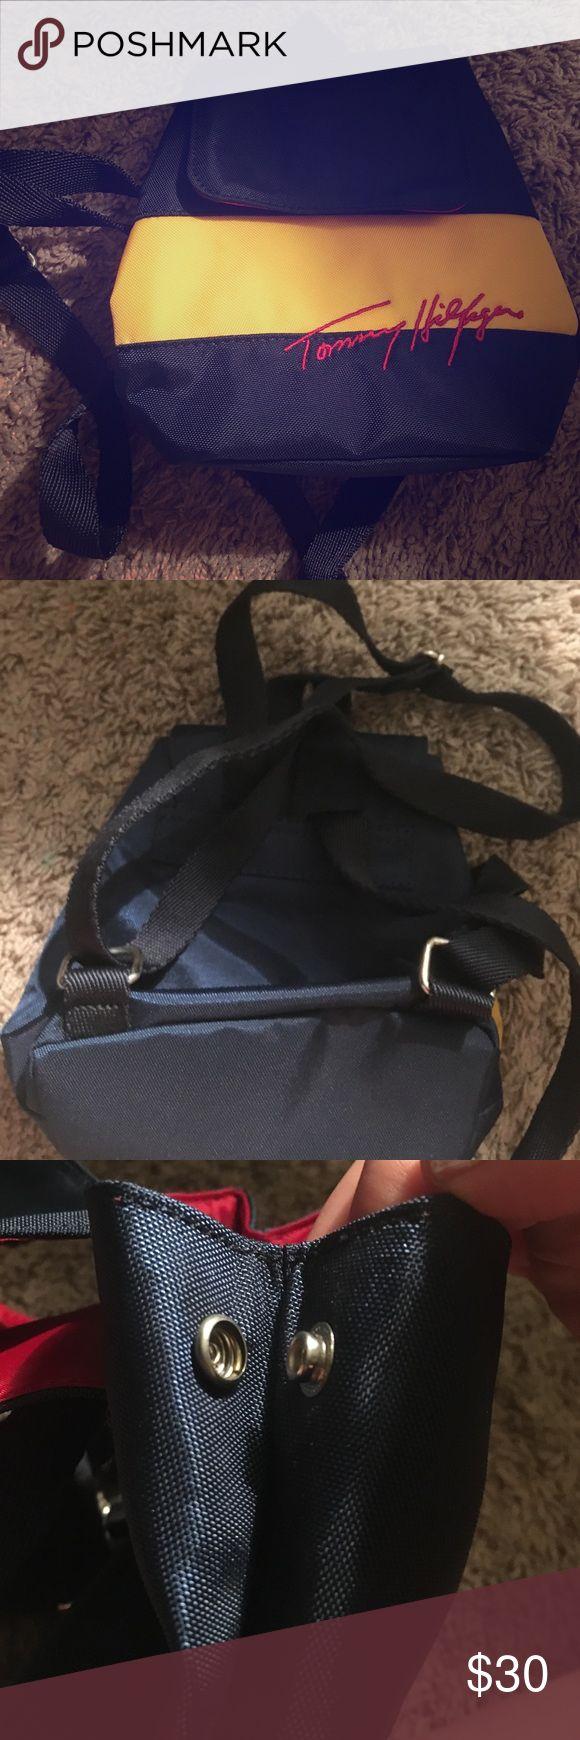 Spotted while shopping on Poshmark: Mini Tommy Hilfiger backpack! #poshmark #fashion #shopping #style #Tommy Hilfiger #Handbags